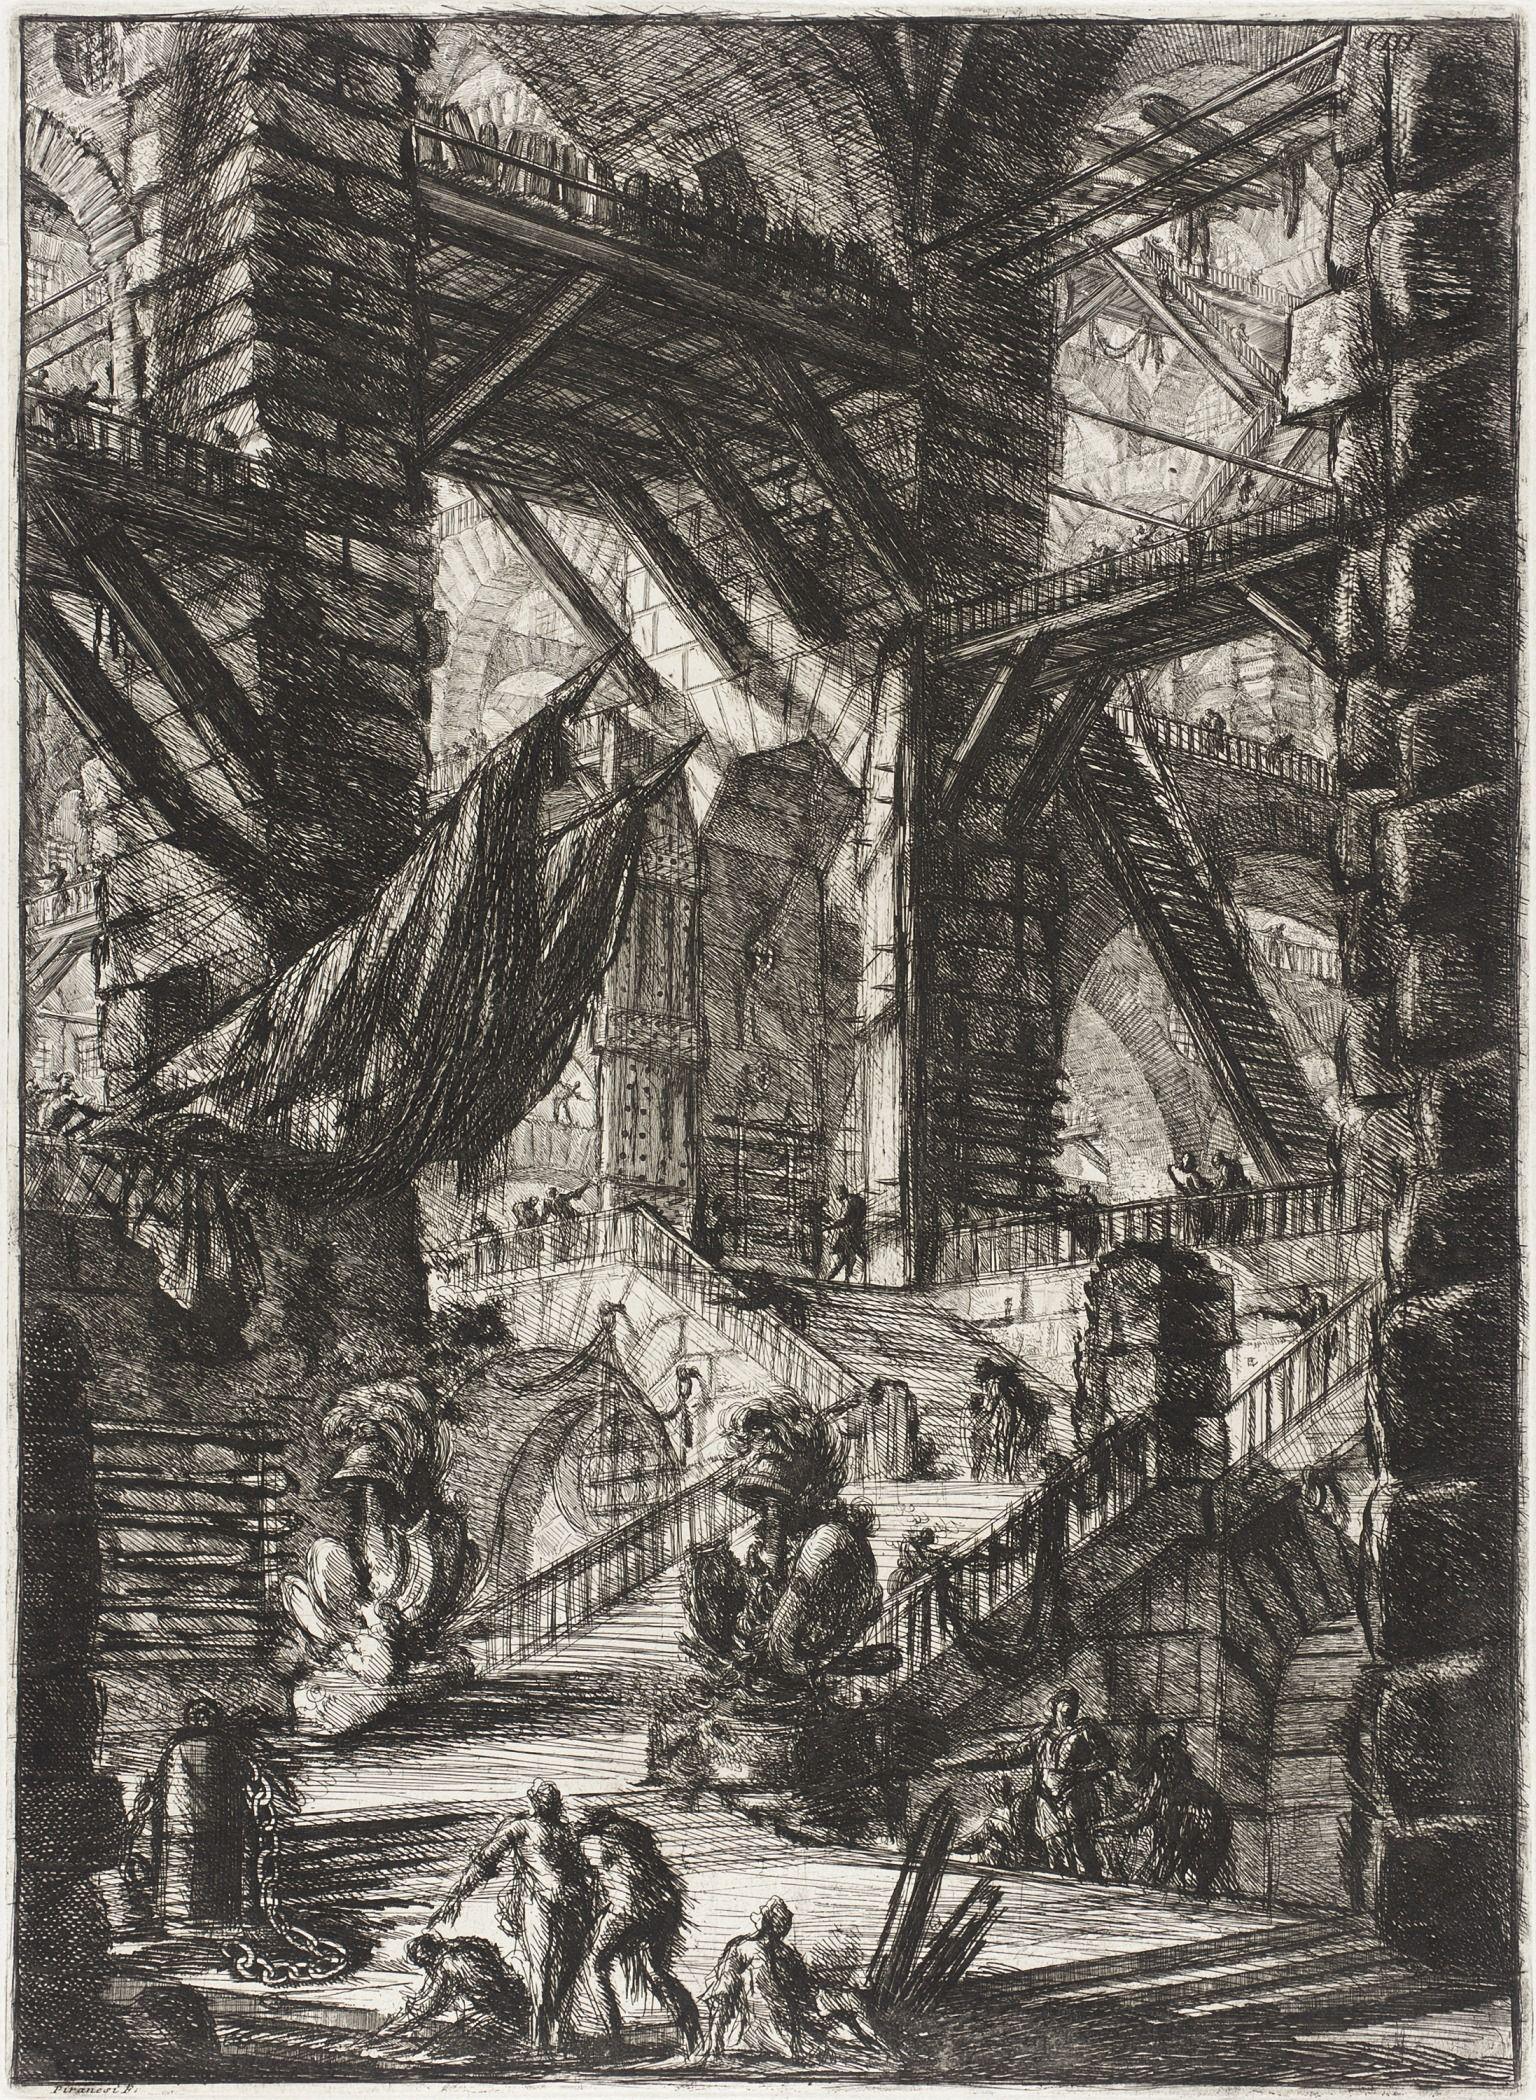 Piranesi-Carceri VIII-The Staircase with Trophies-1761